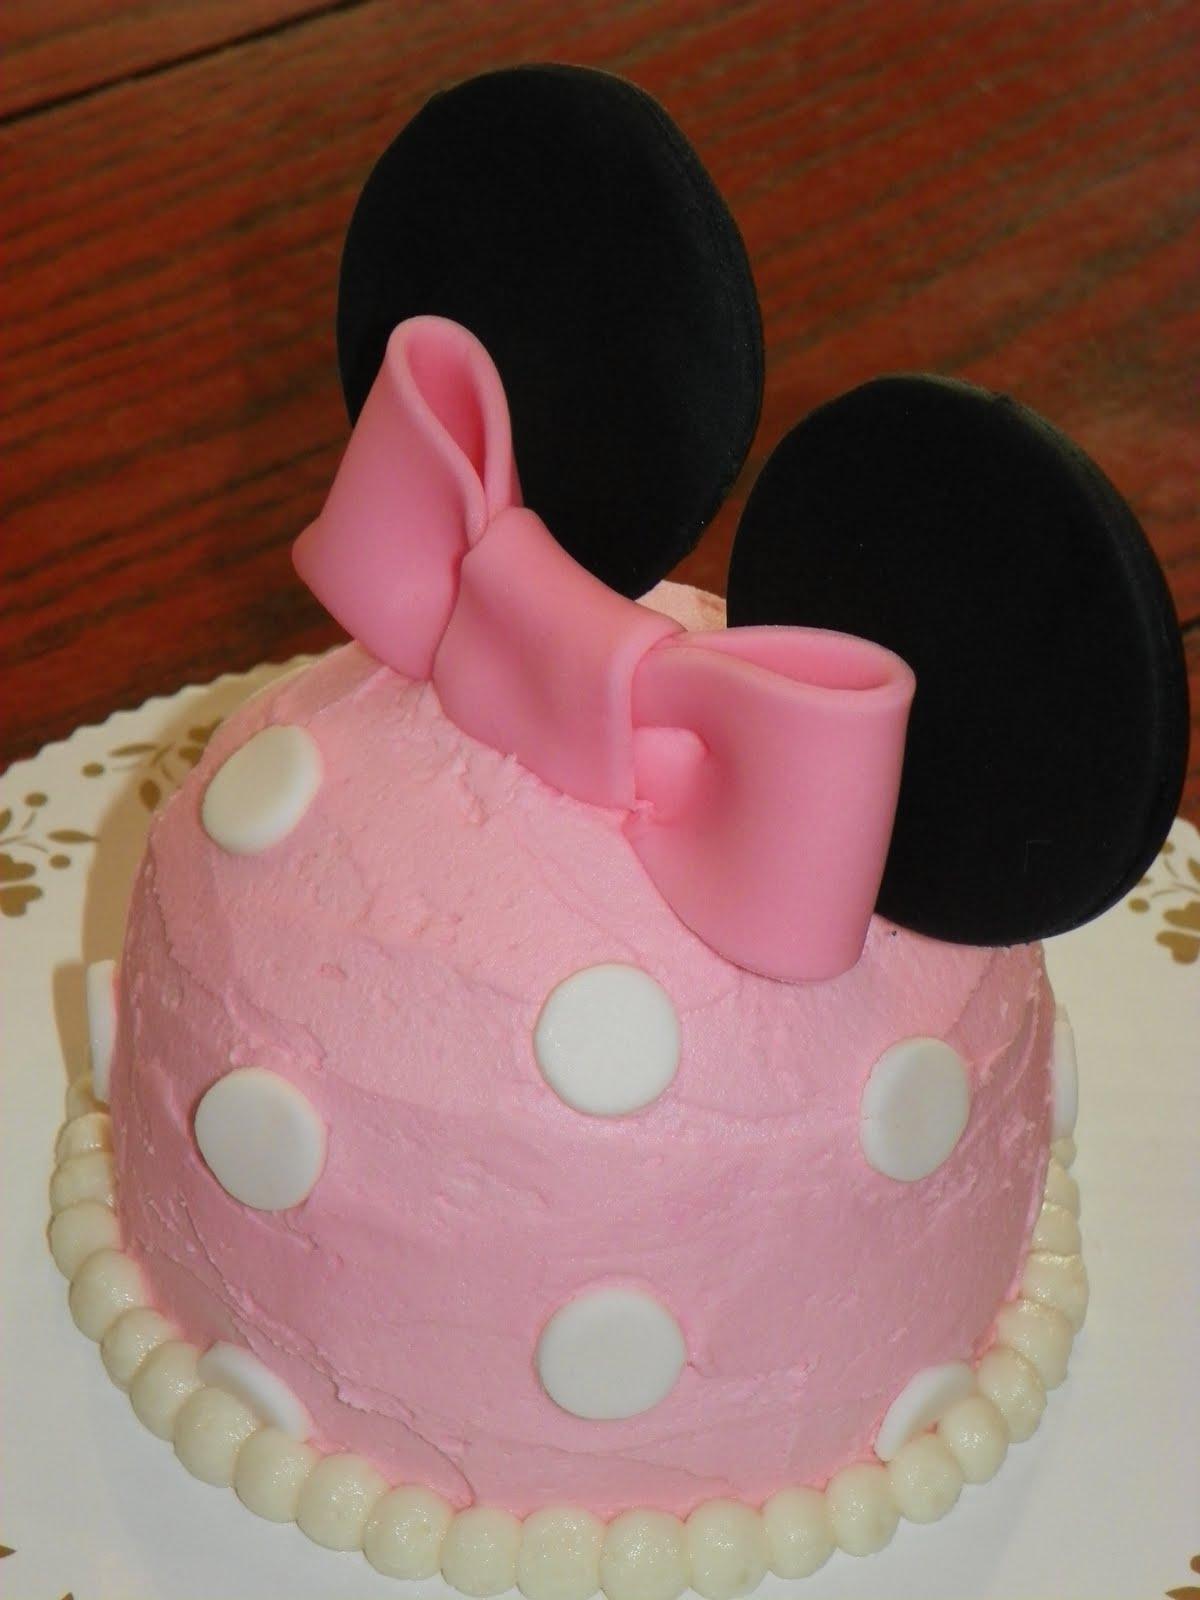 Plumeria Cake Studio Minnie Mouse Cupcakes And Mini Cake